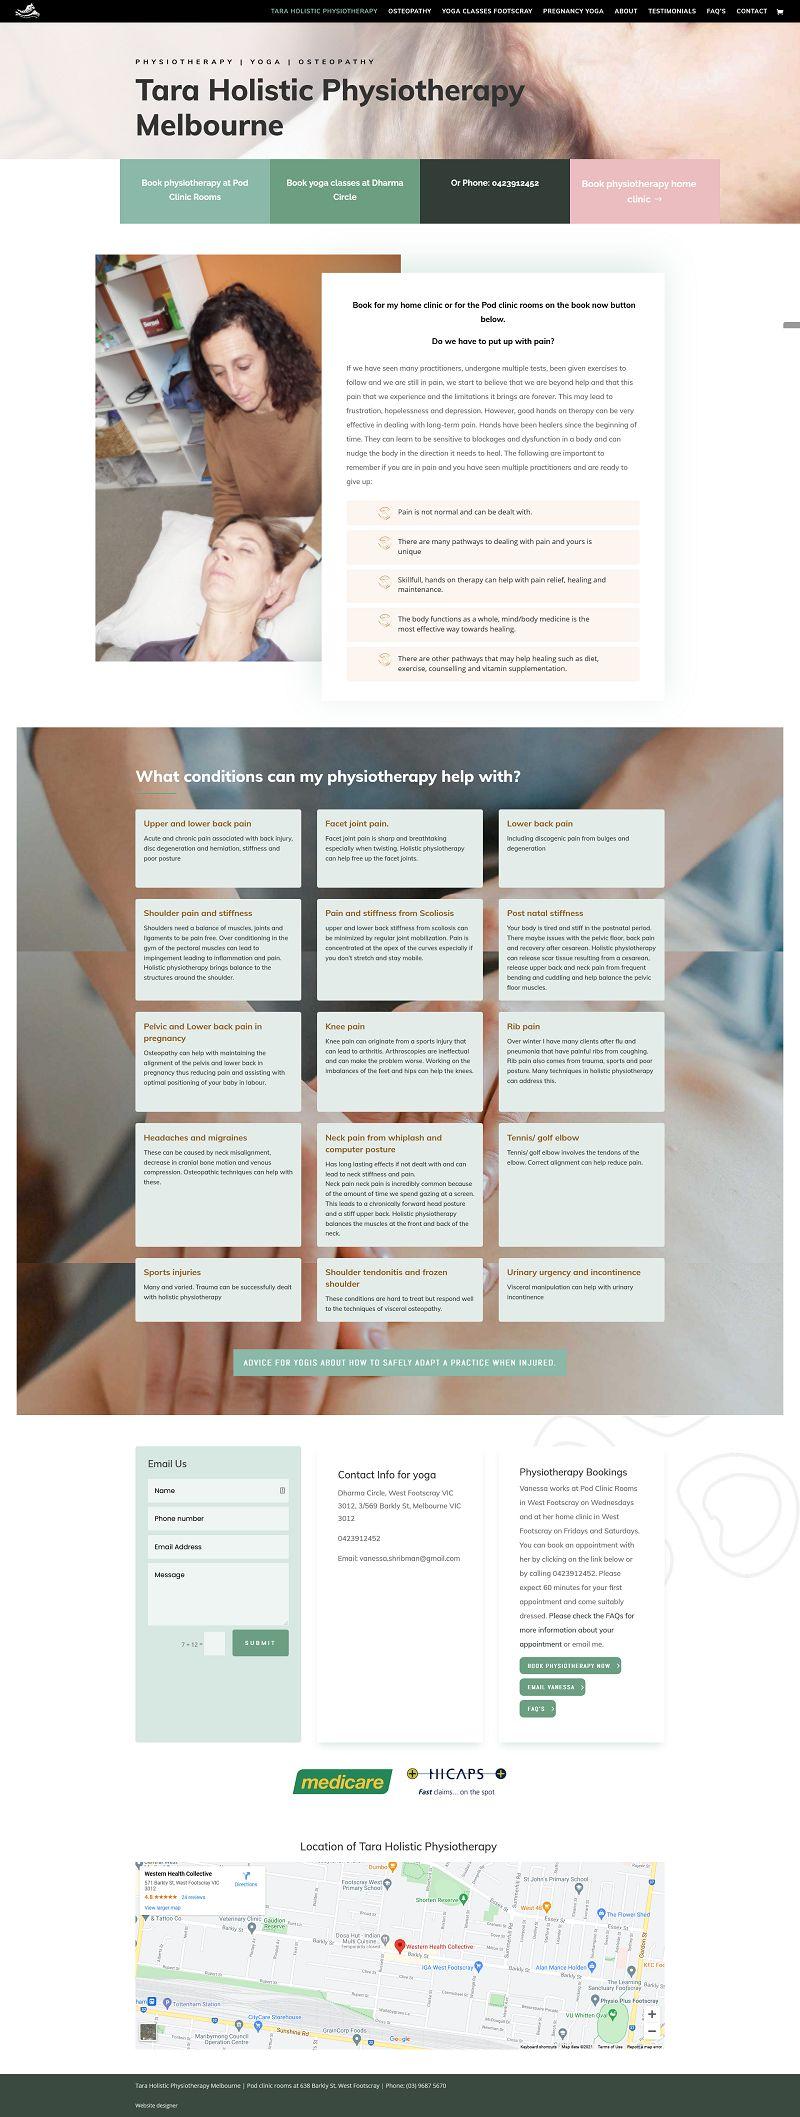 rebuild website in WordPress and Divi